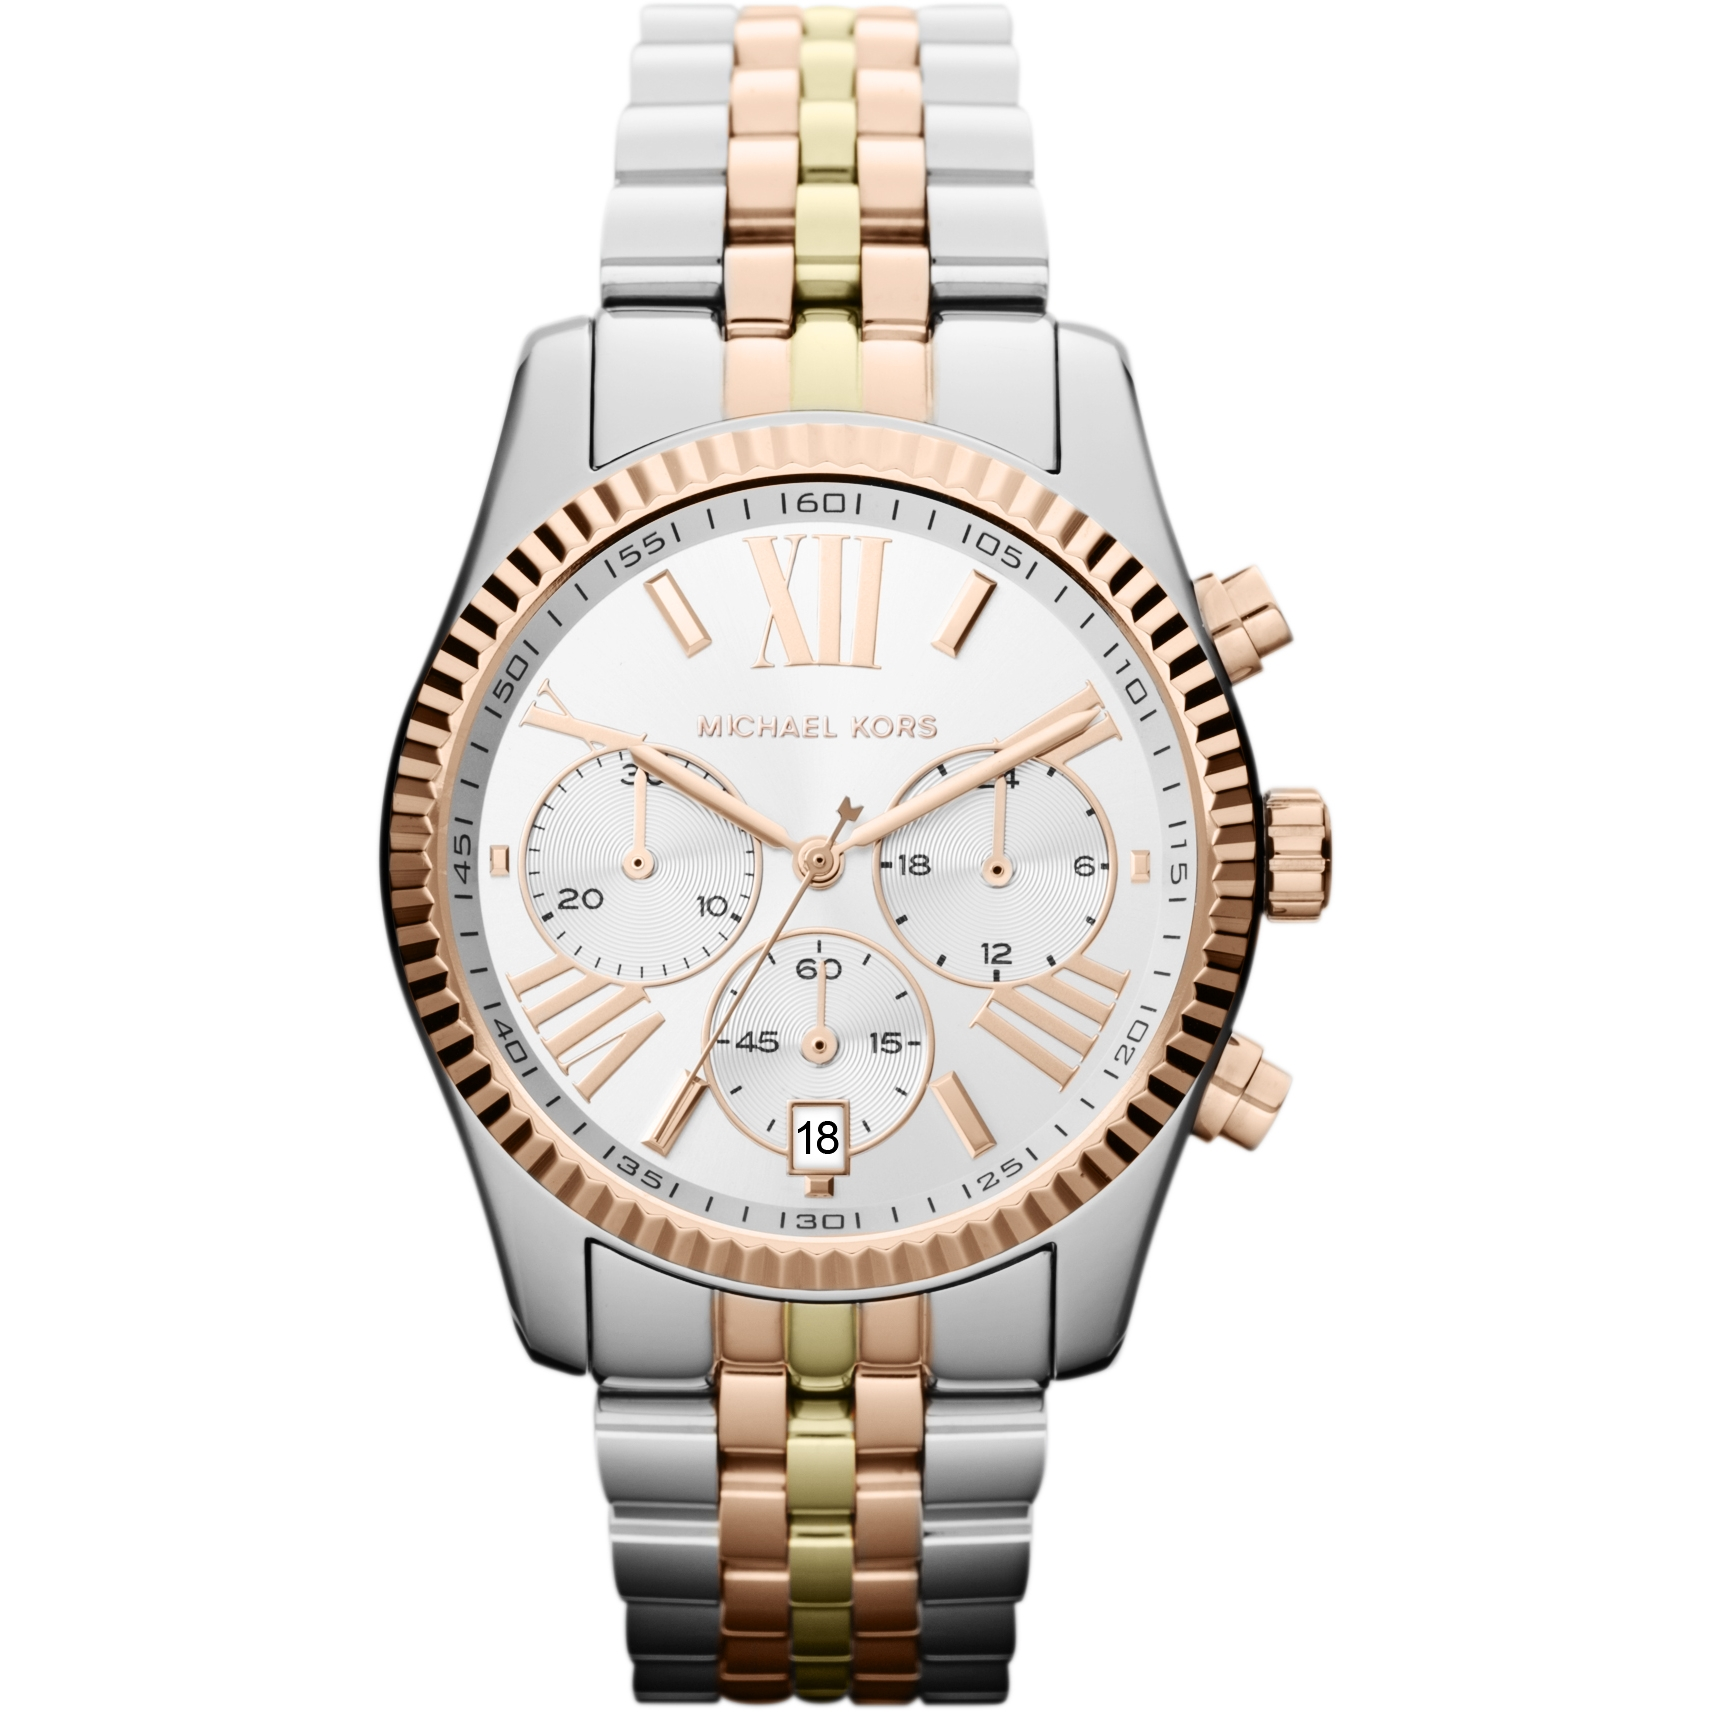 d1dbd8213f49 Ladies Michael Kors Lexington Chronograph Watch (MK5735)